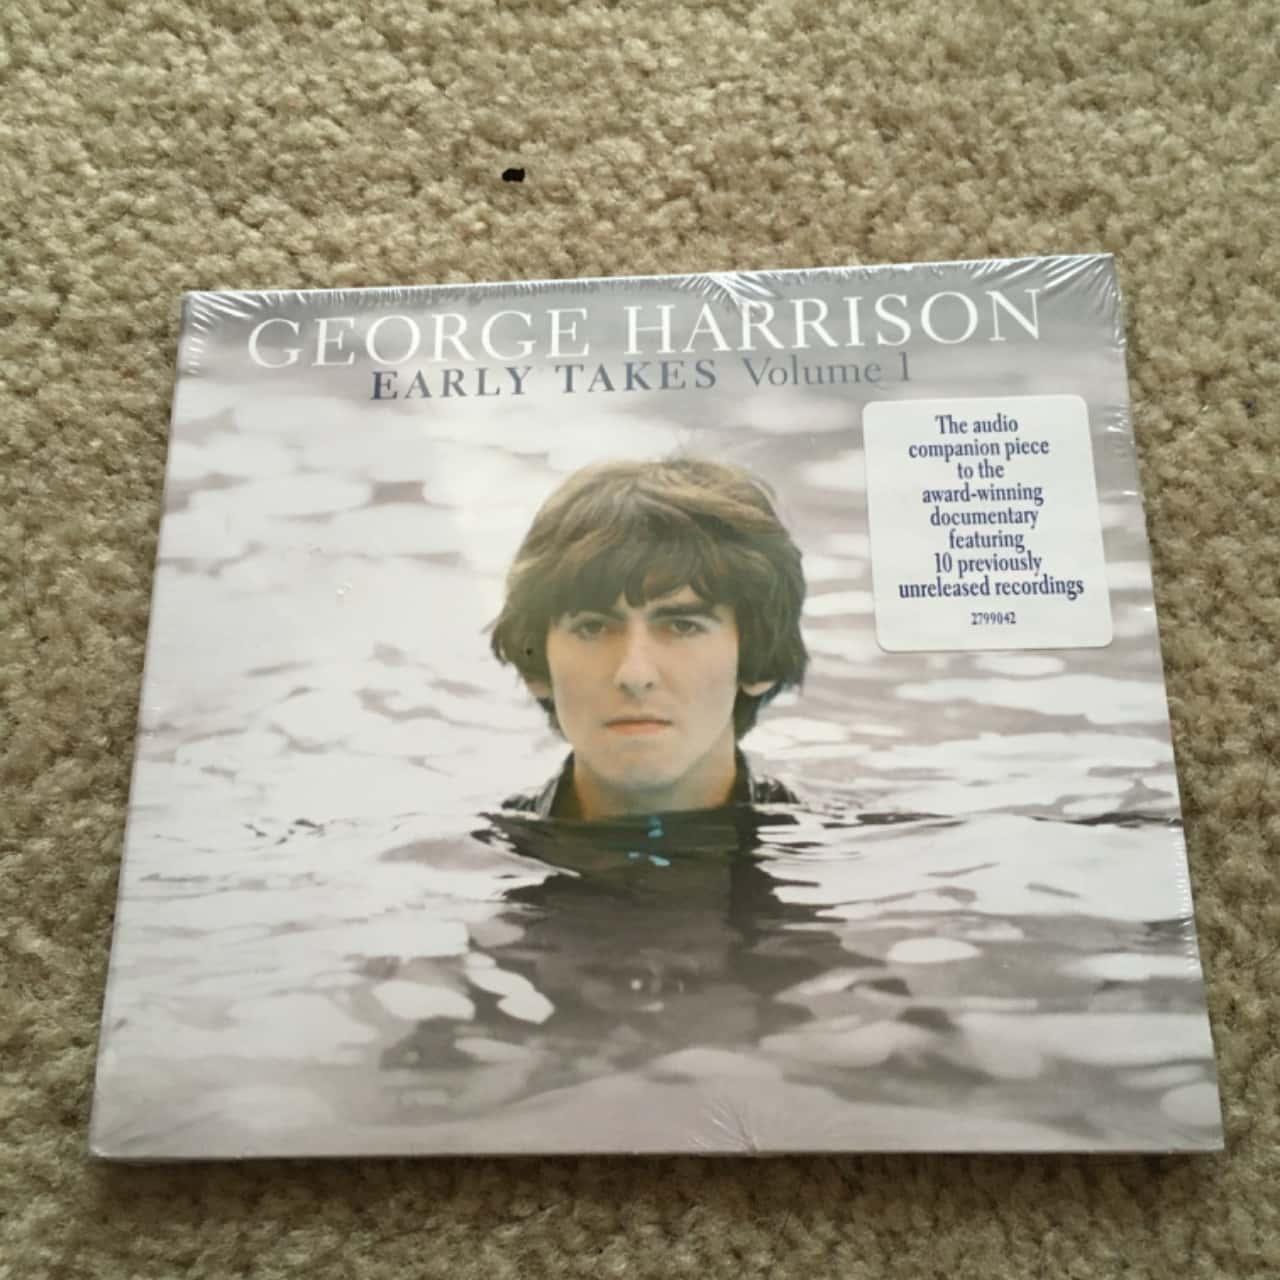 George Harrison Early Takes CD - Vol 1, BNWOT